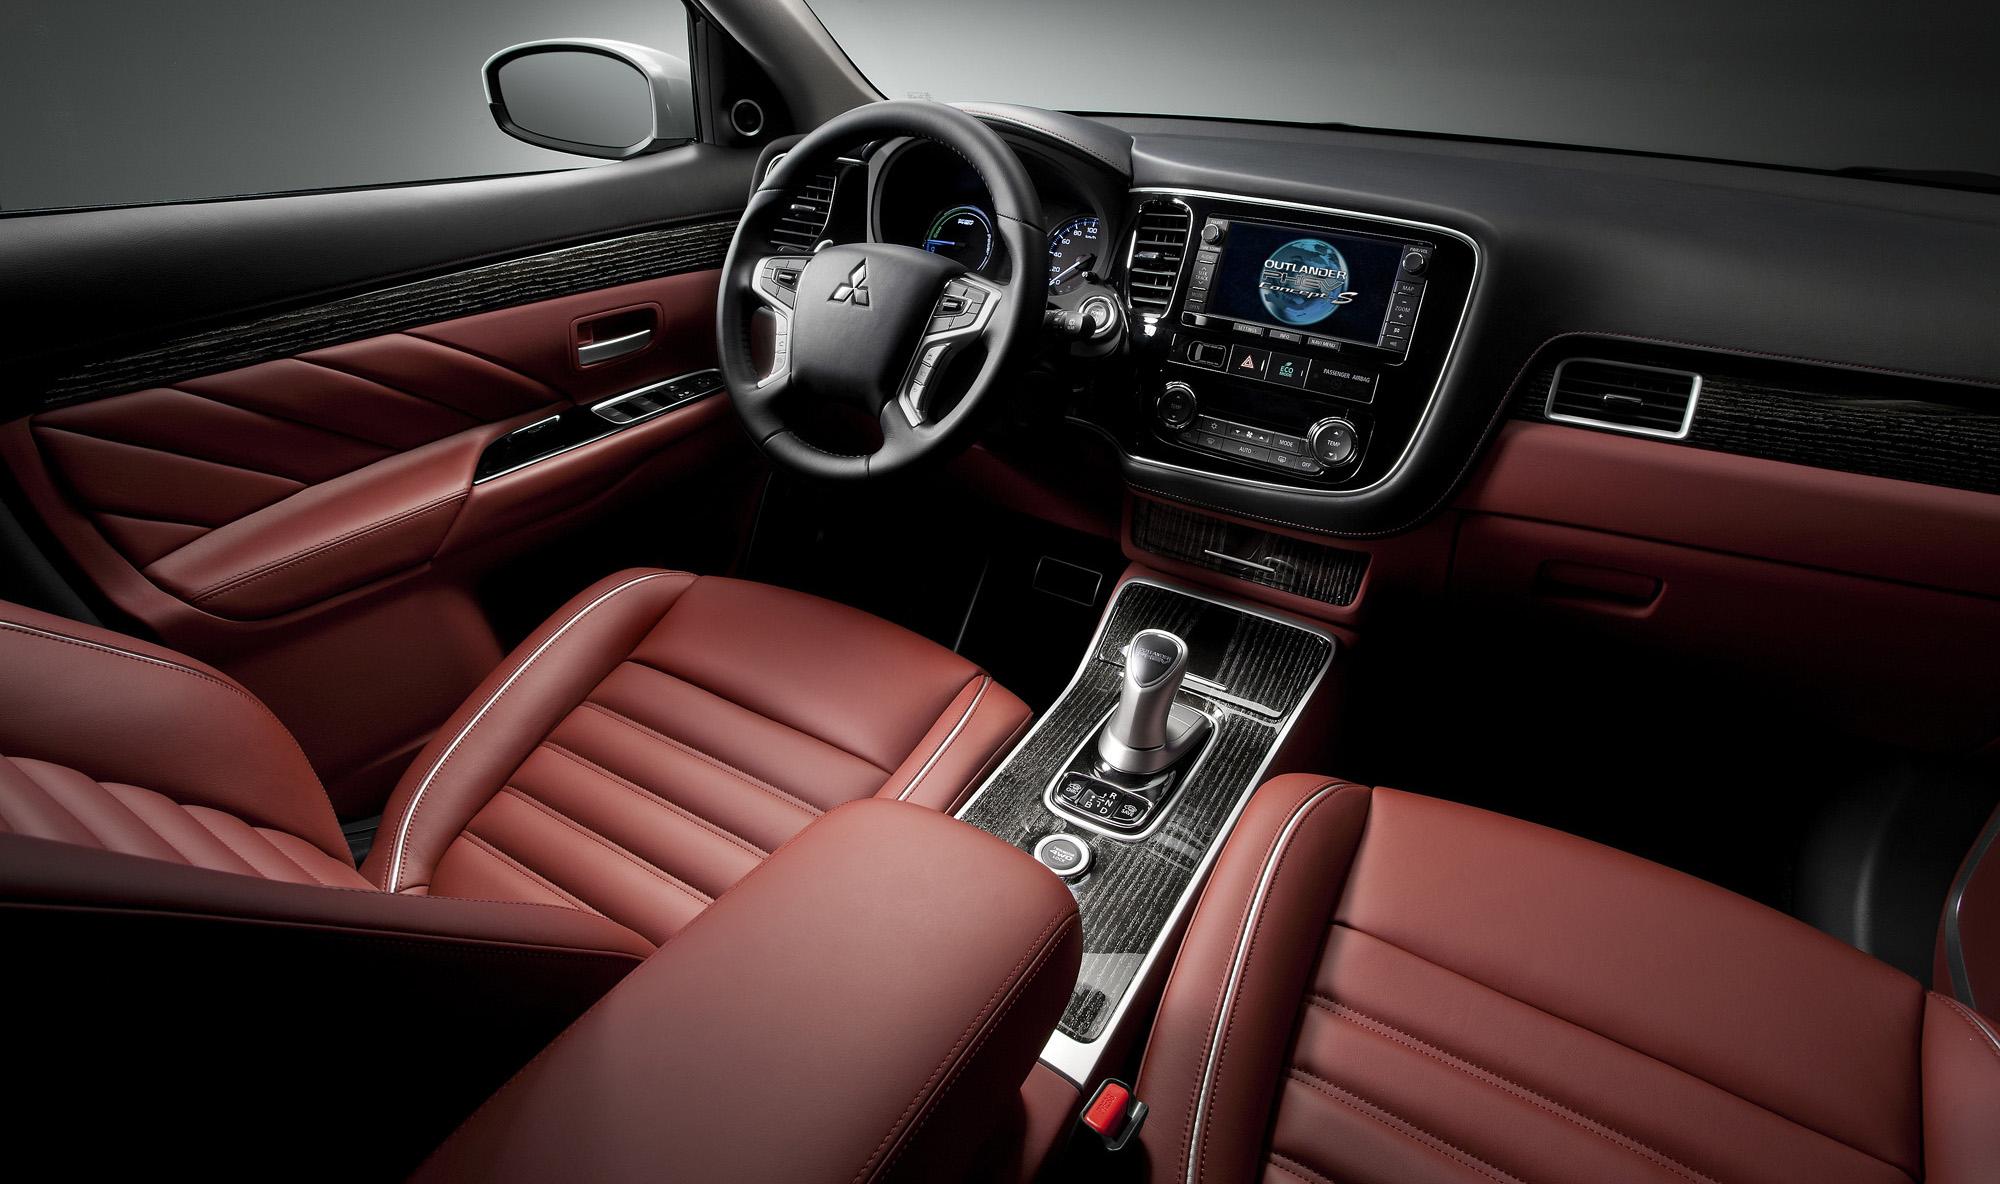 2014 Mitsubishi Outlander PHEV Concept-S - Concepts